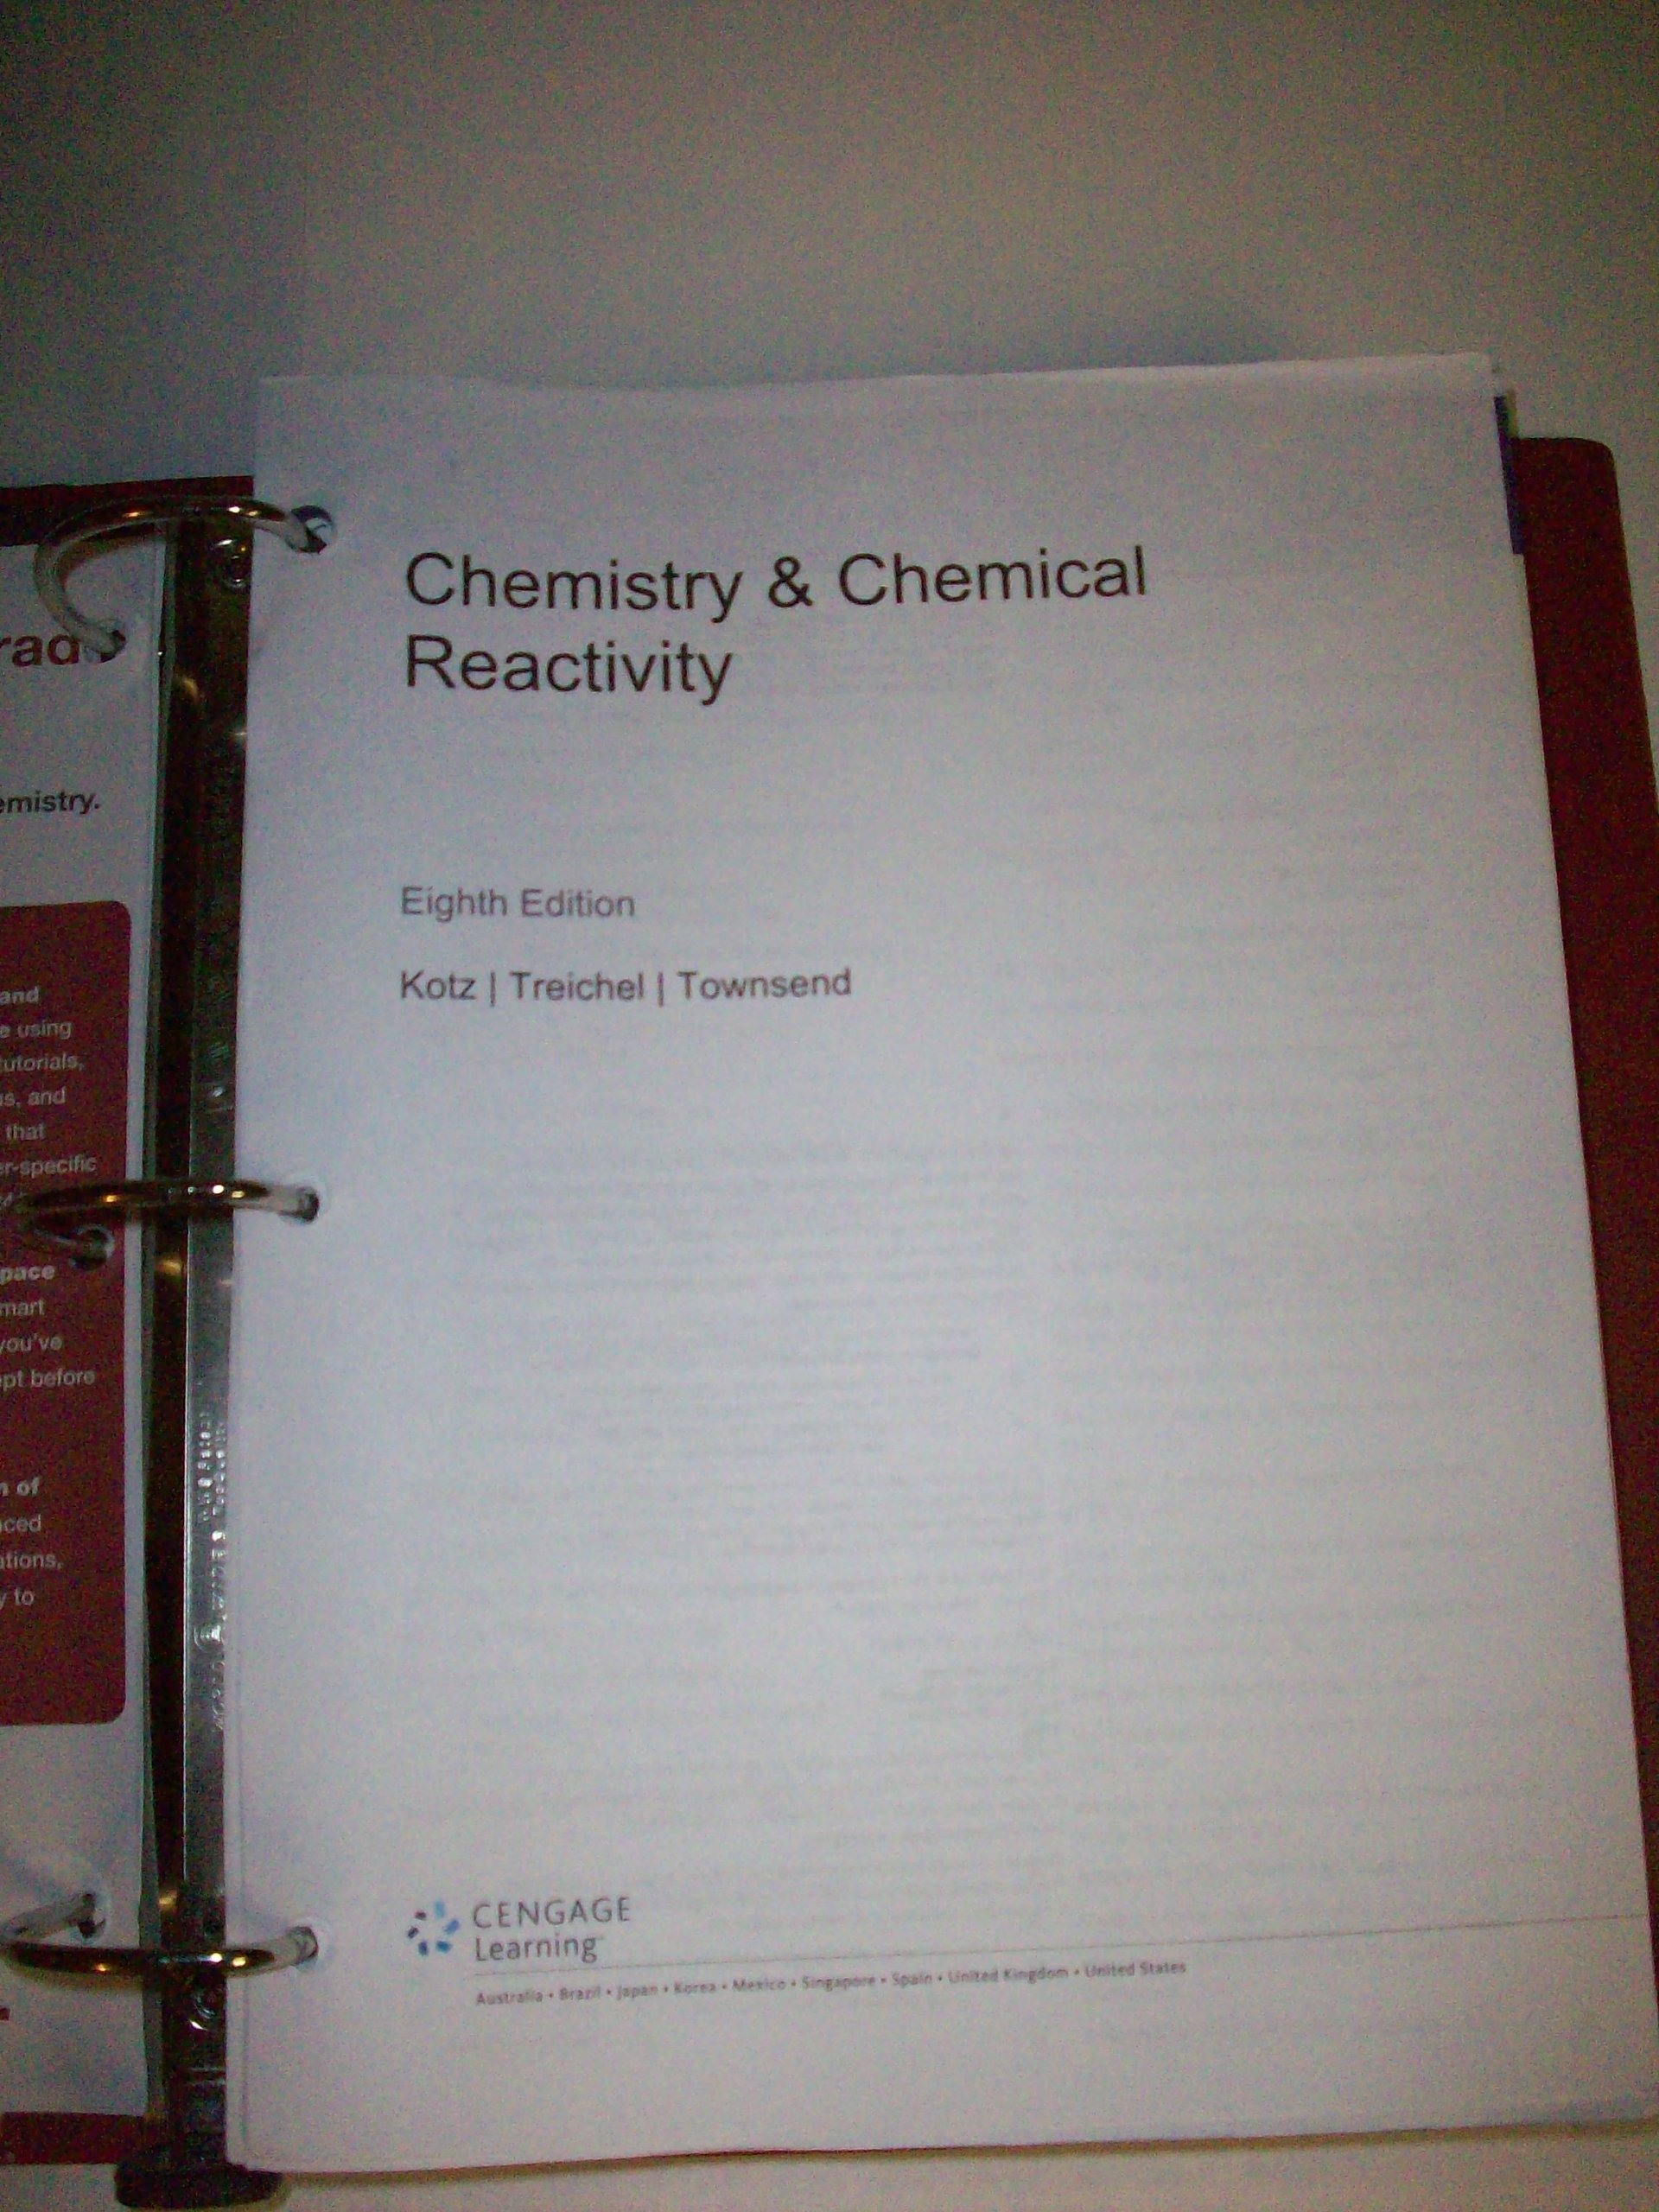 Chemistry & Chemical Reactivity Eighth Edition: John C. Kotz, Paul M.  Treichel, John Townsend: 9781133270898: Amazon.com: Books